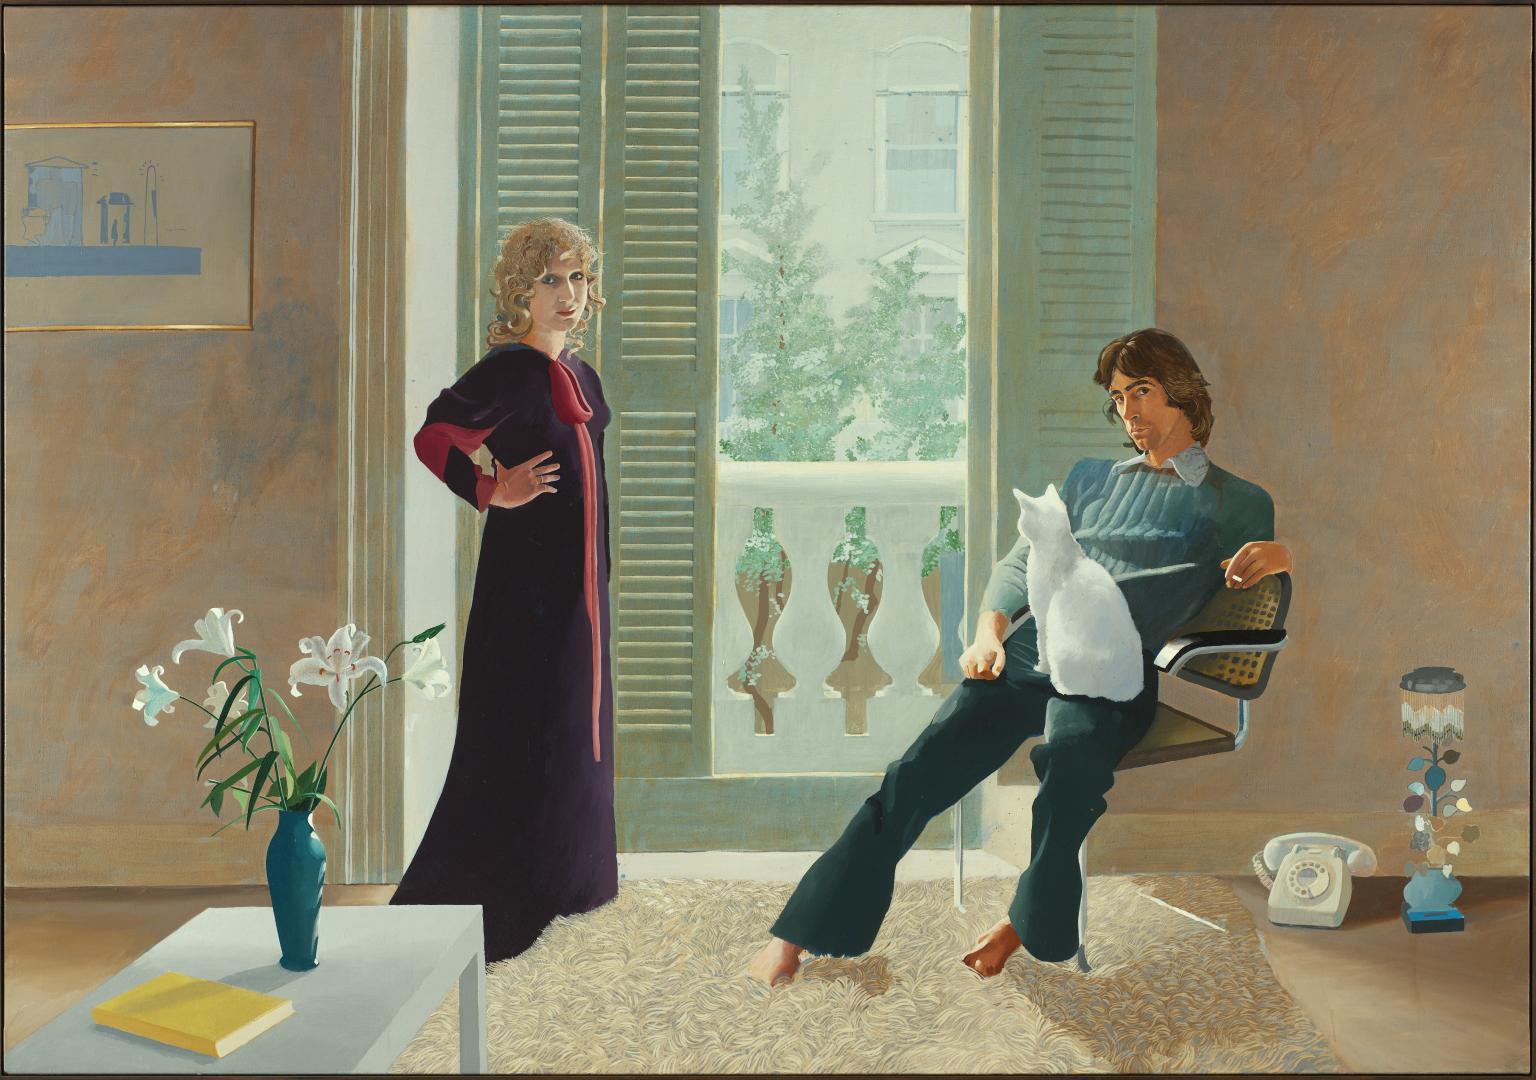 Mr and Mrs Clark and Percy, David Hockney, 1970-71